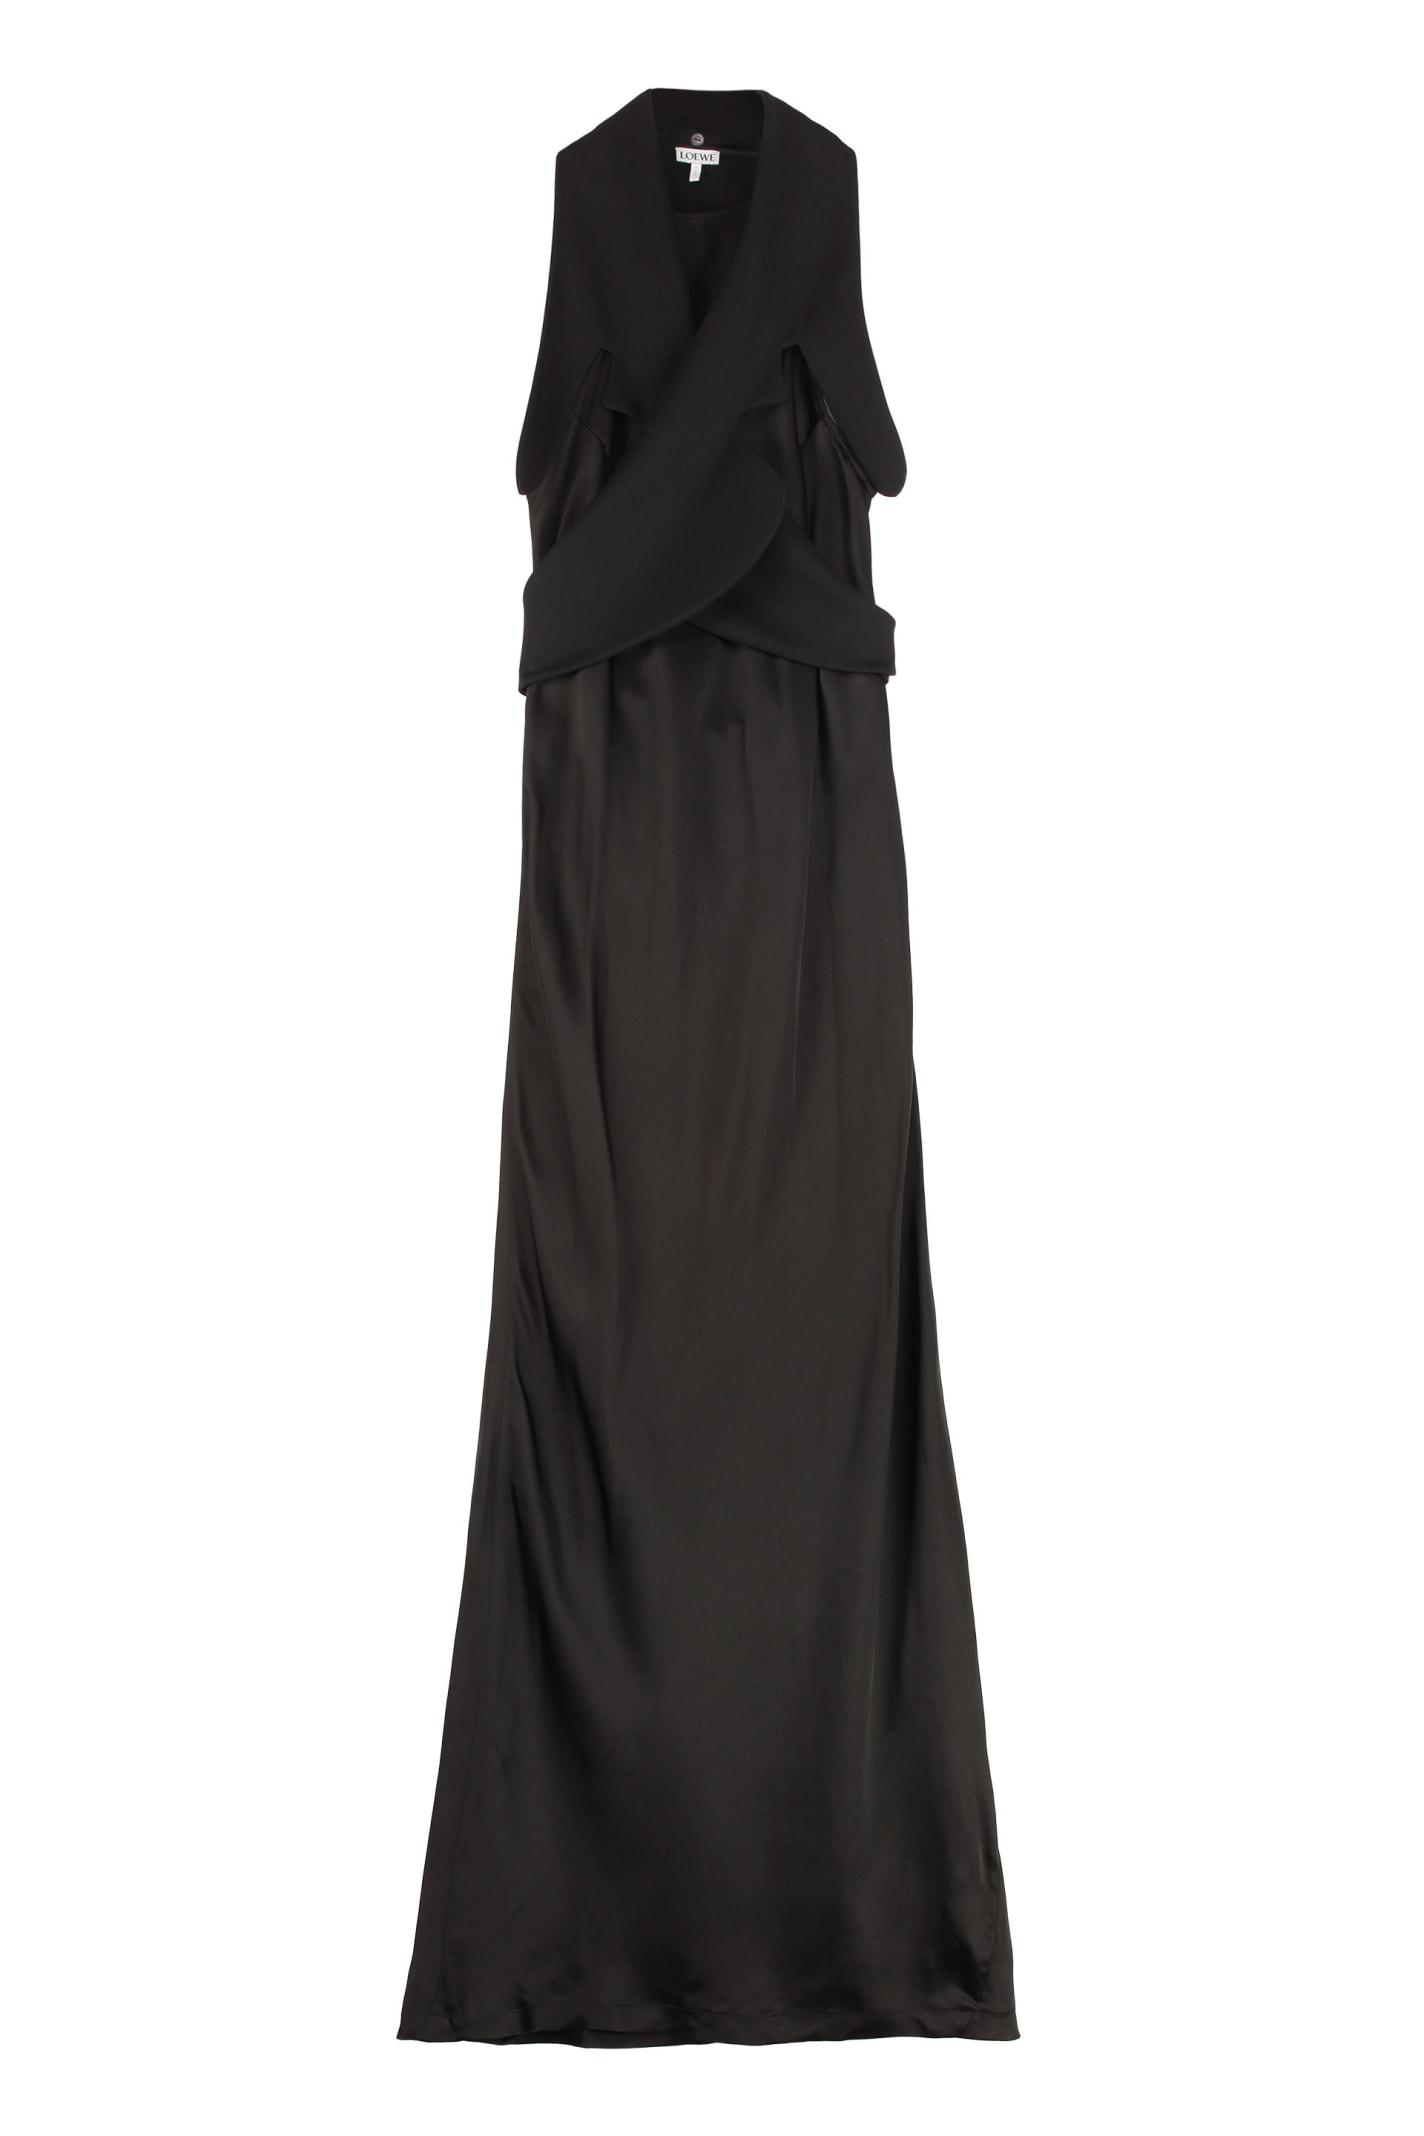 Buy Loewe Viscose Dress online, shop Loewe with free shipping